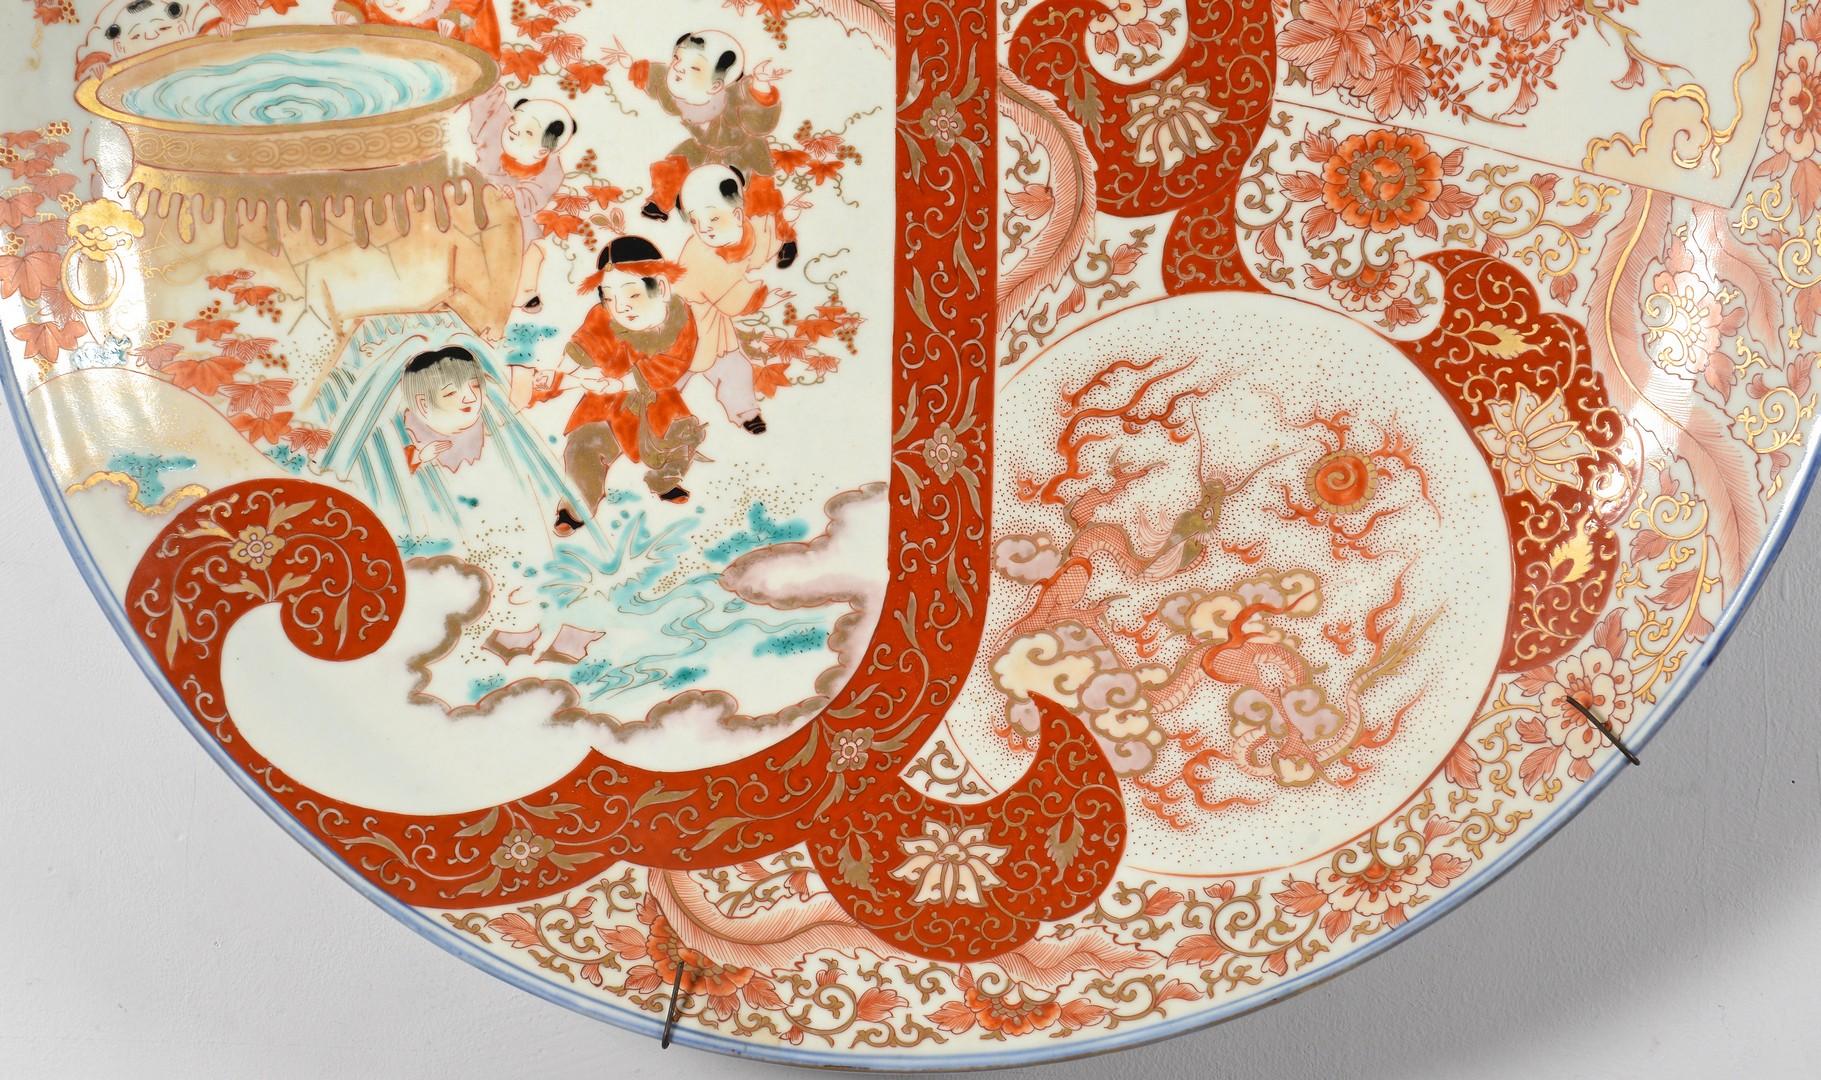 Lot 3832383: Large Japanese Imari Charger